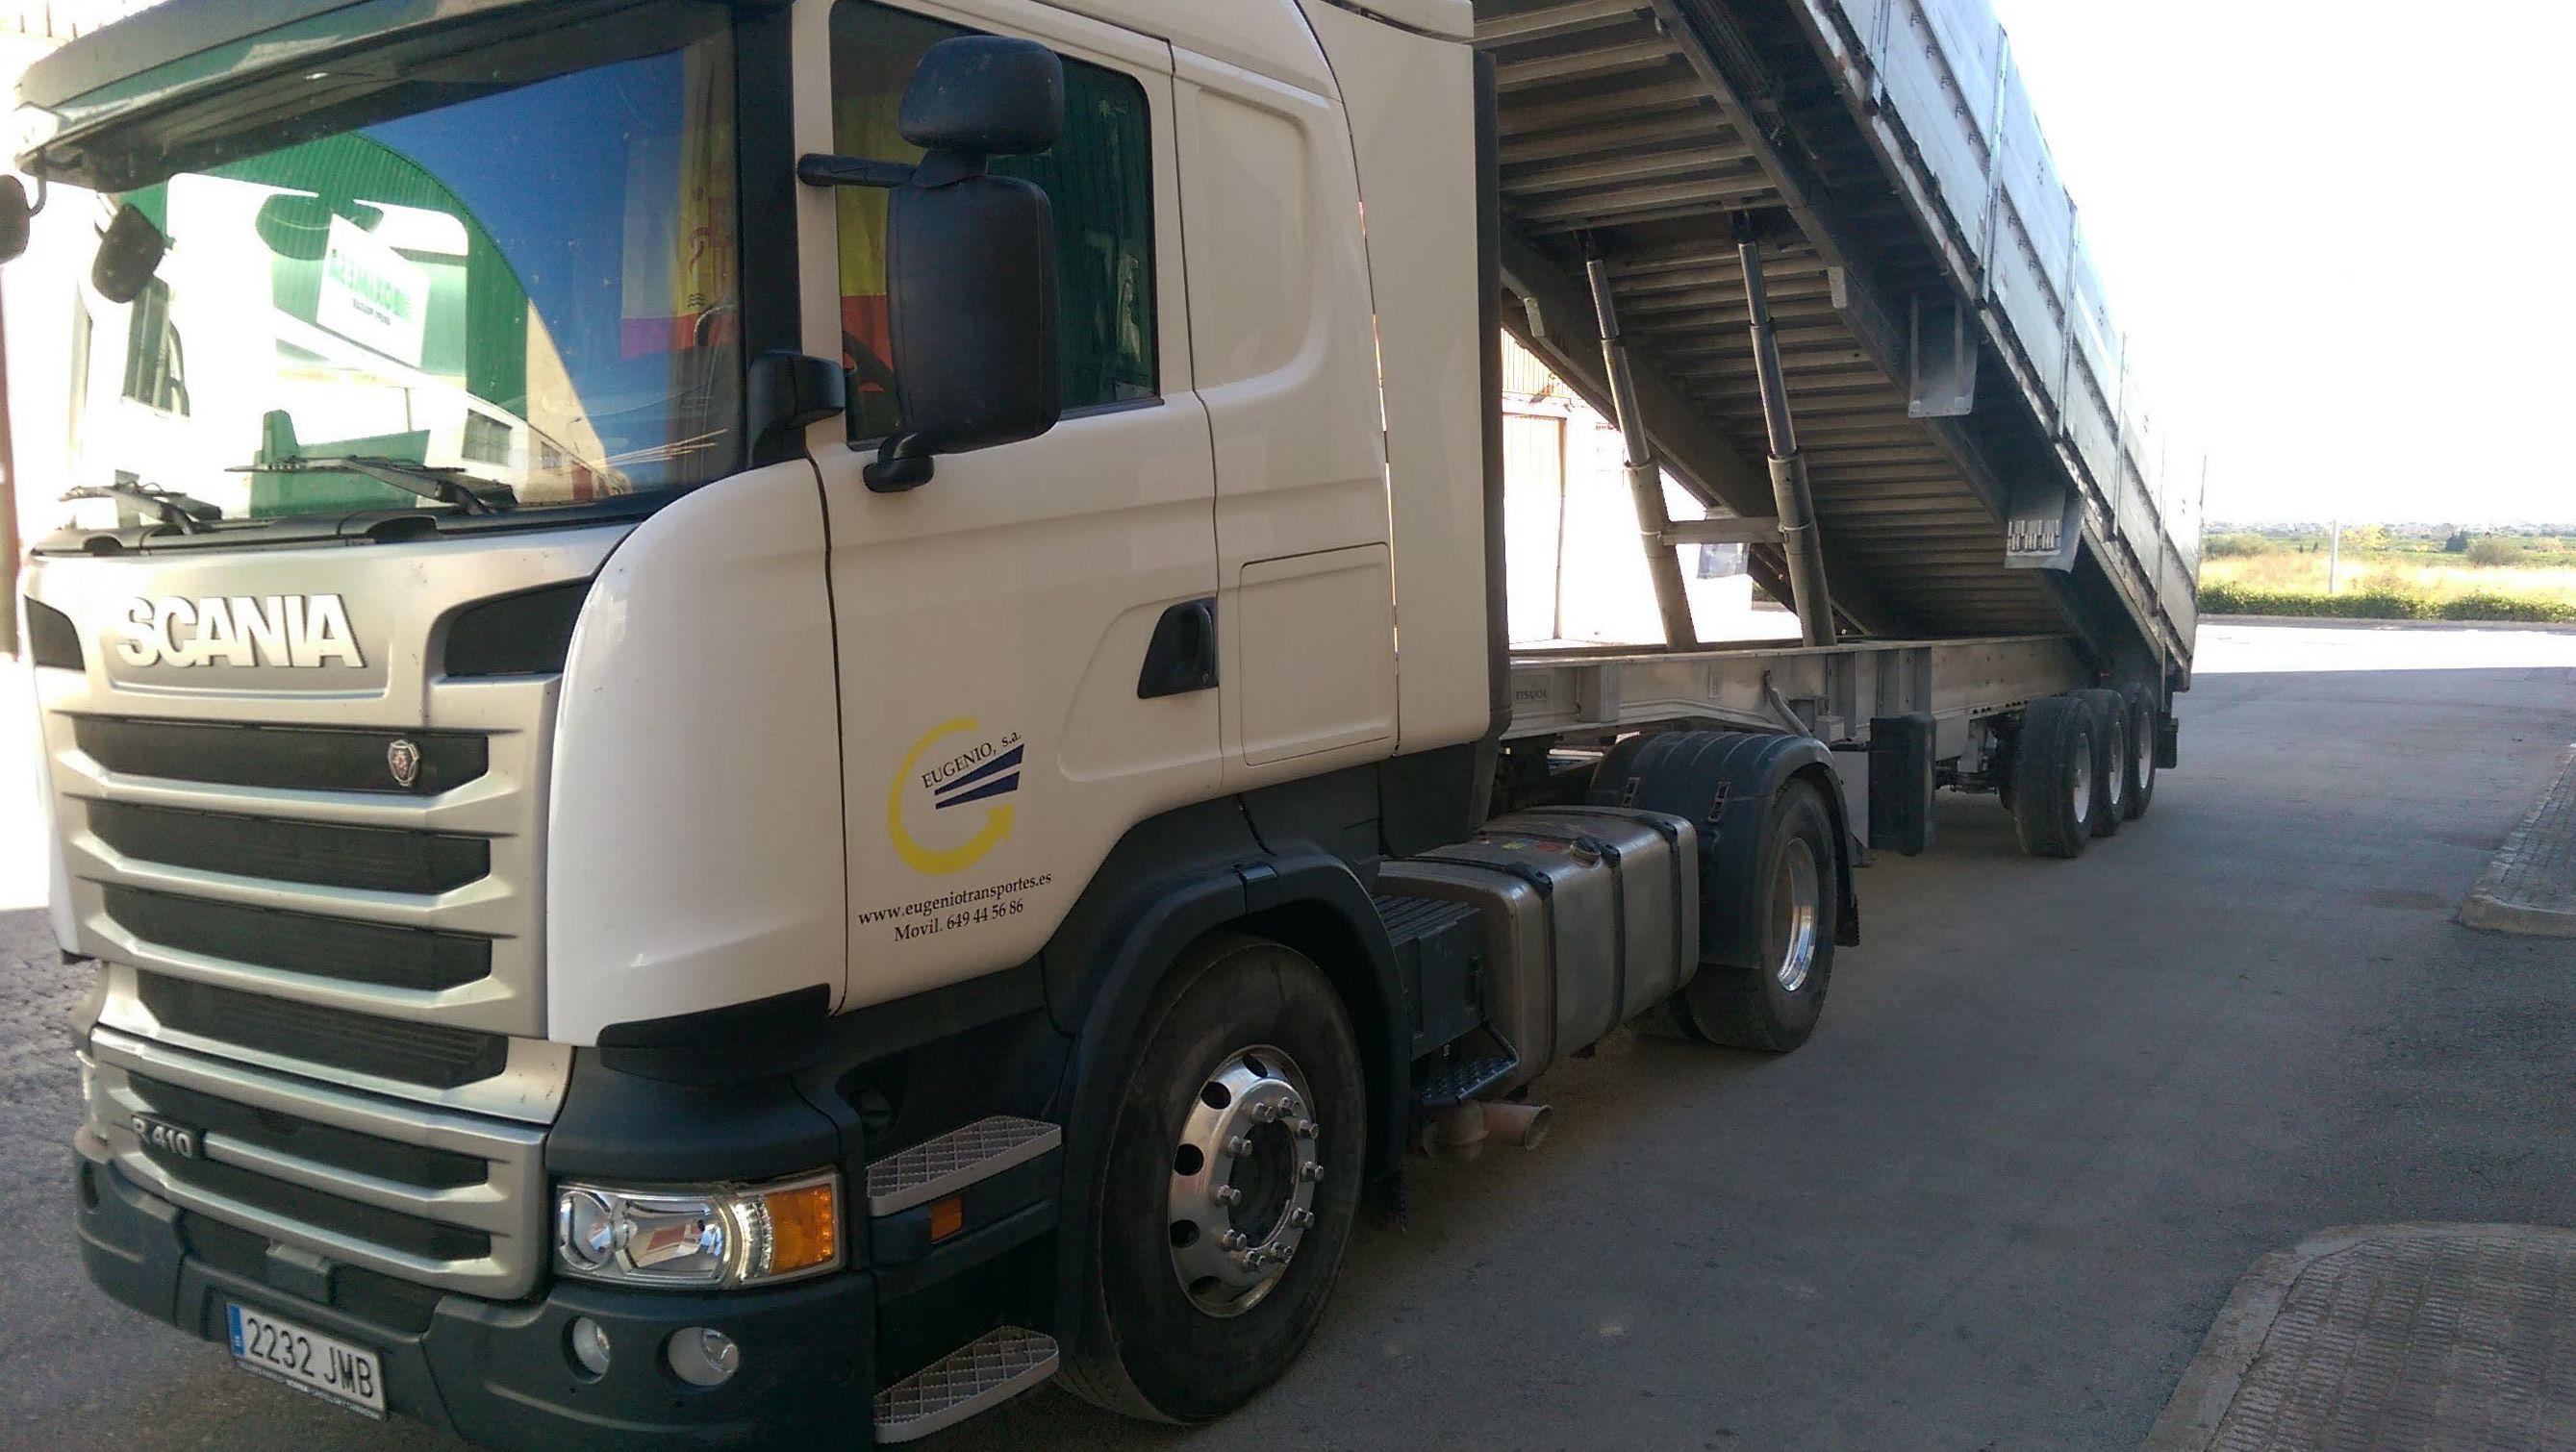 Foto 7 de Transporte de mercancías en Ribesalbes | EUGENIO, S. A.